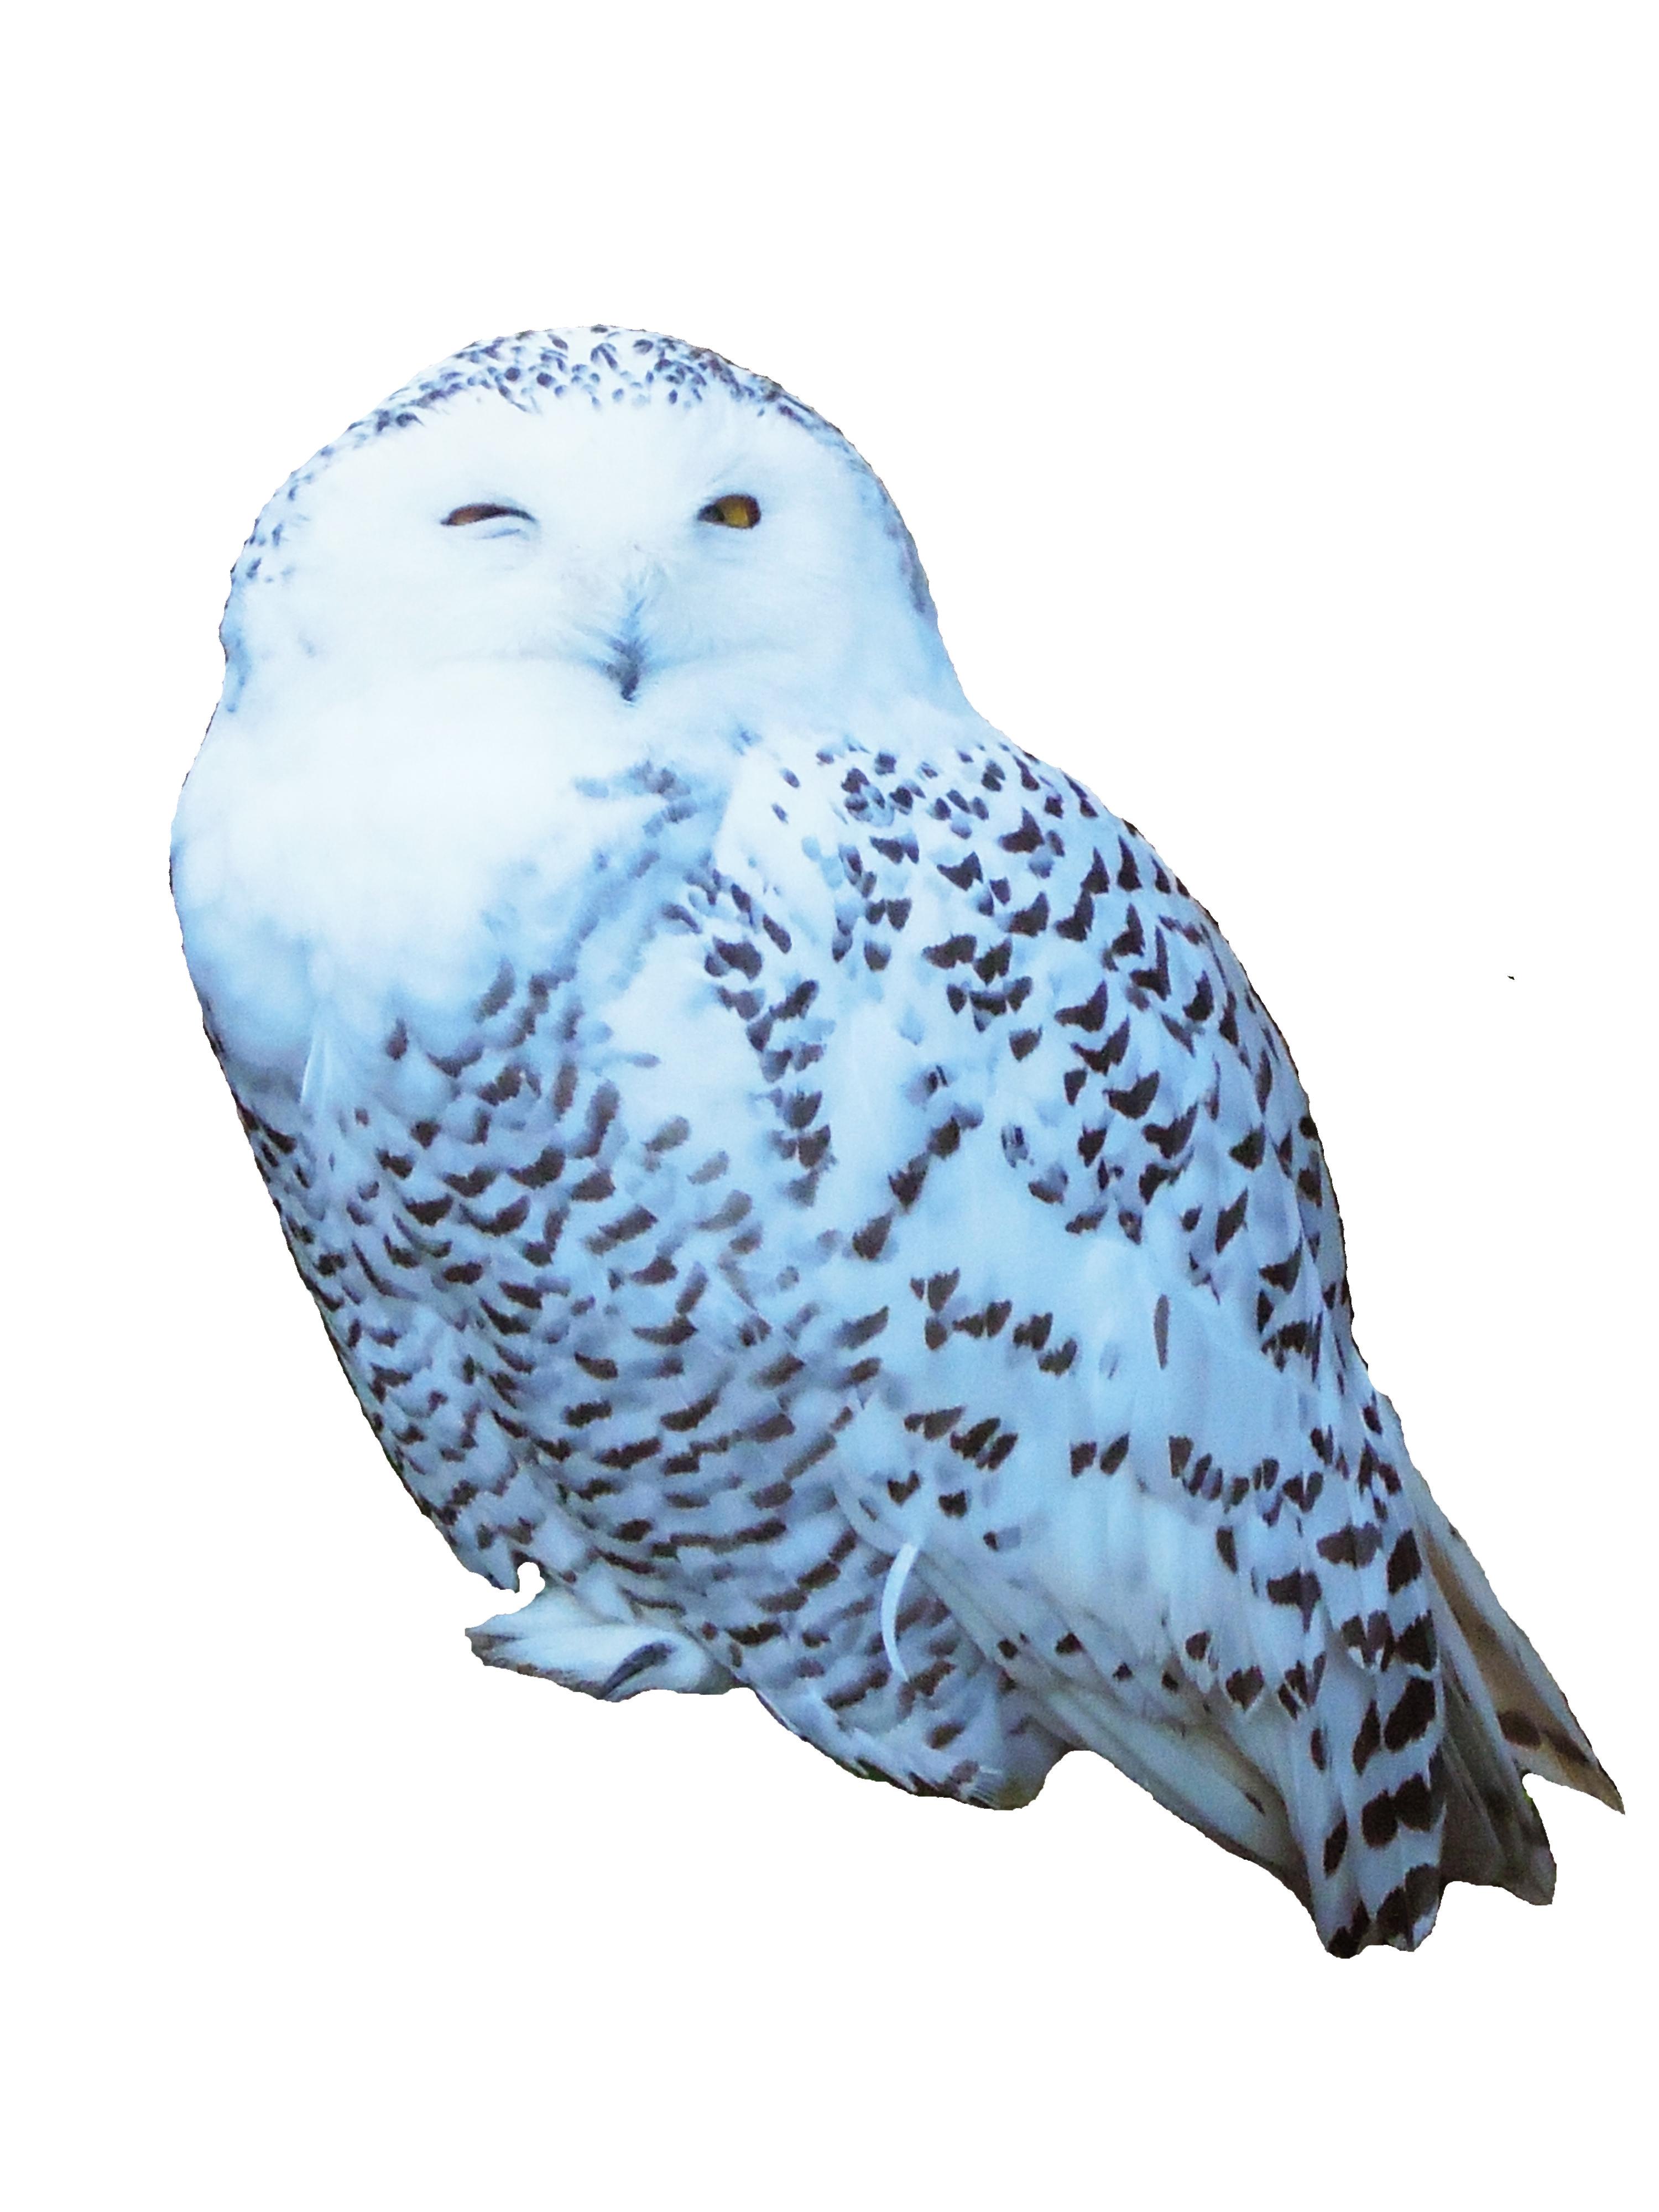 owlowl